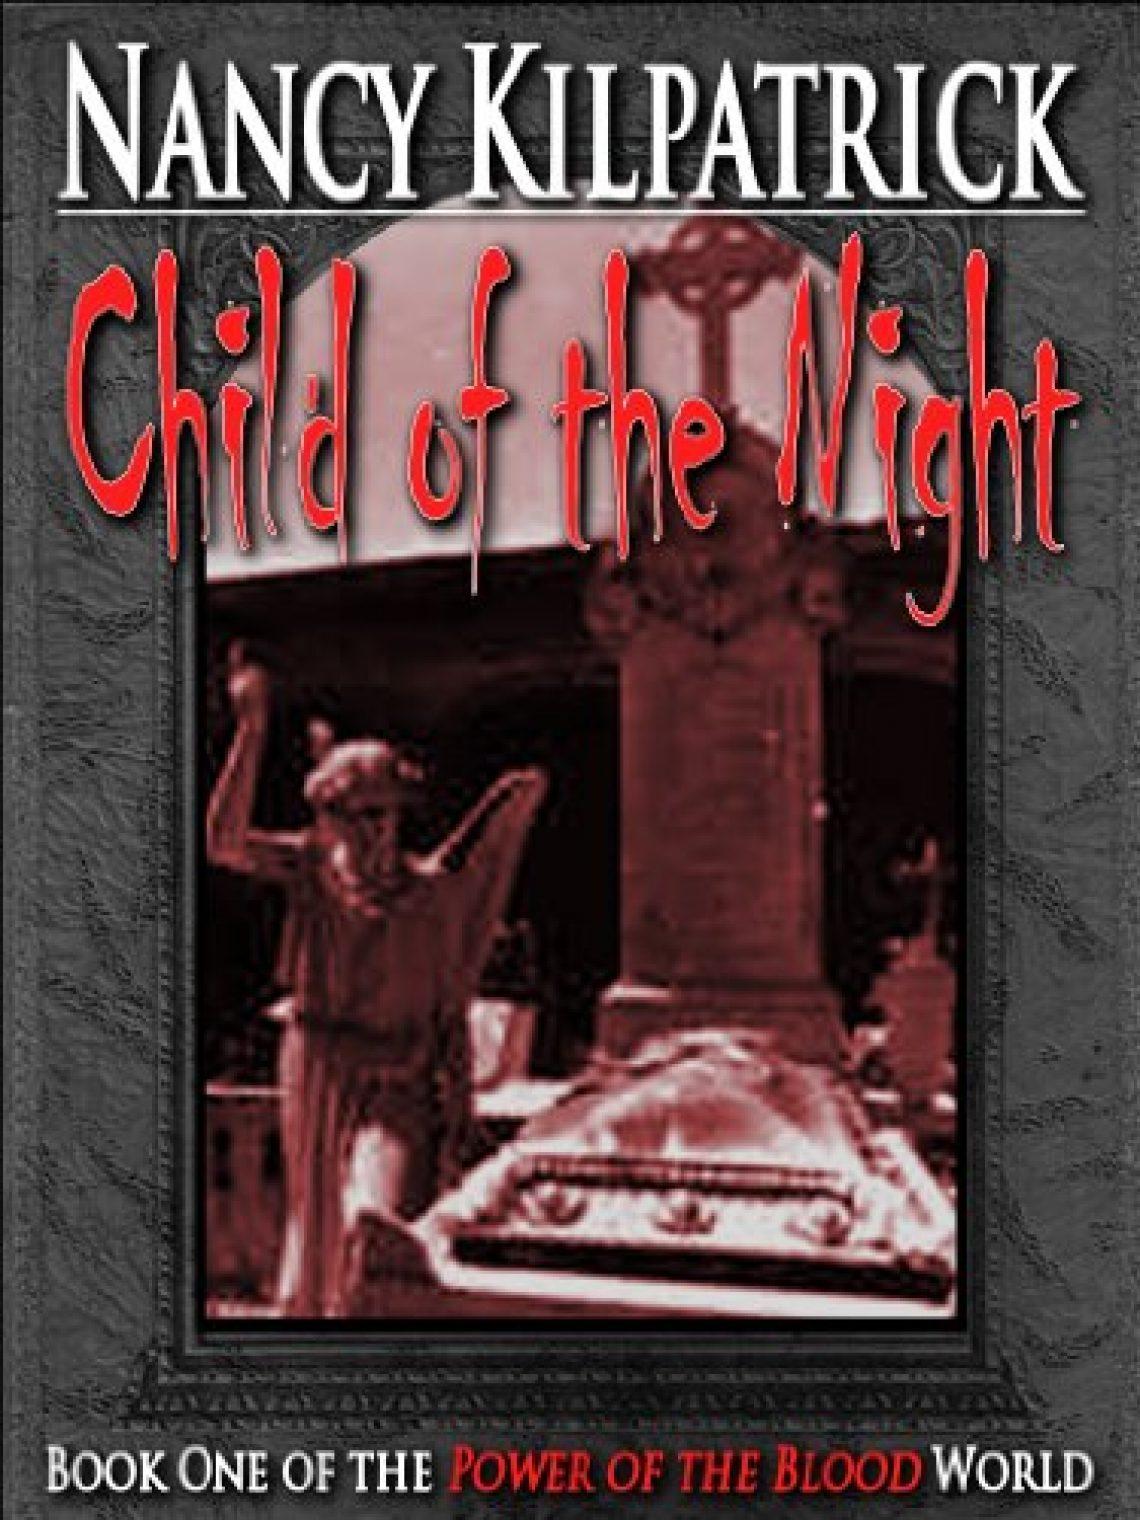 childofthenight